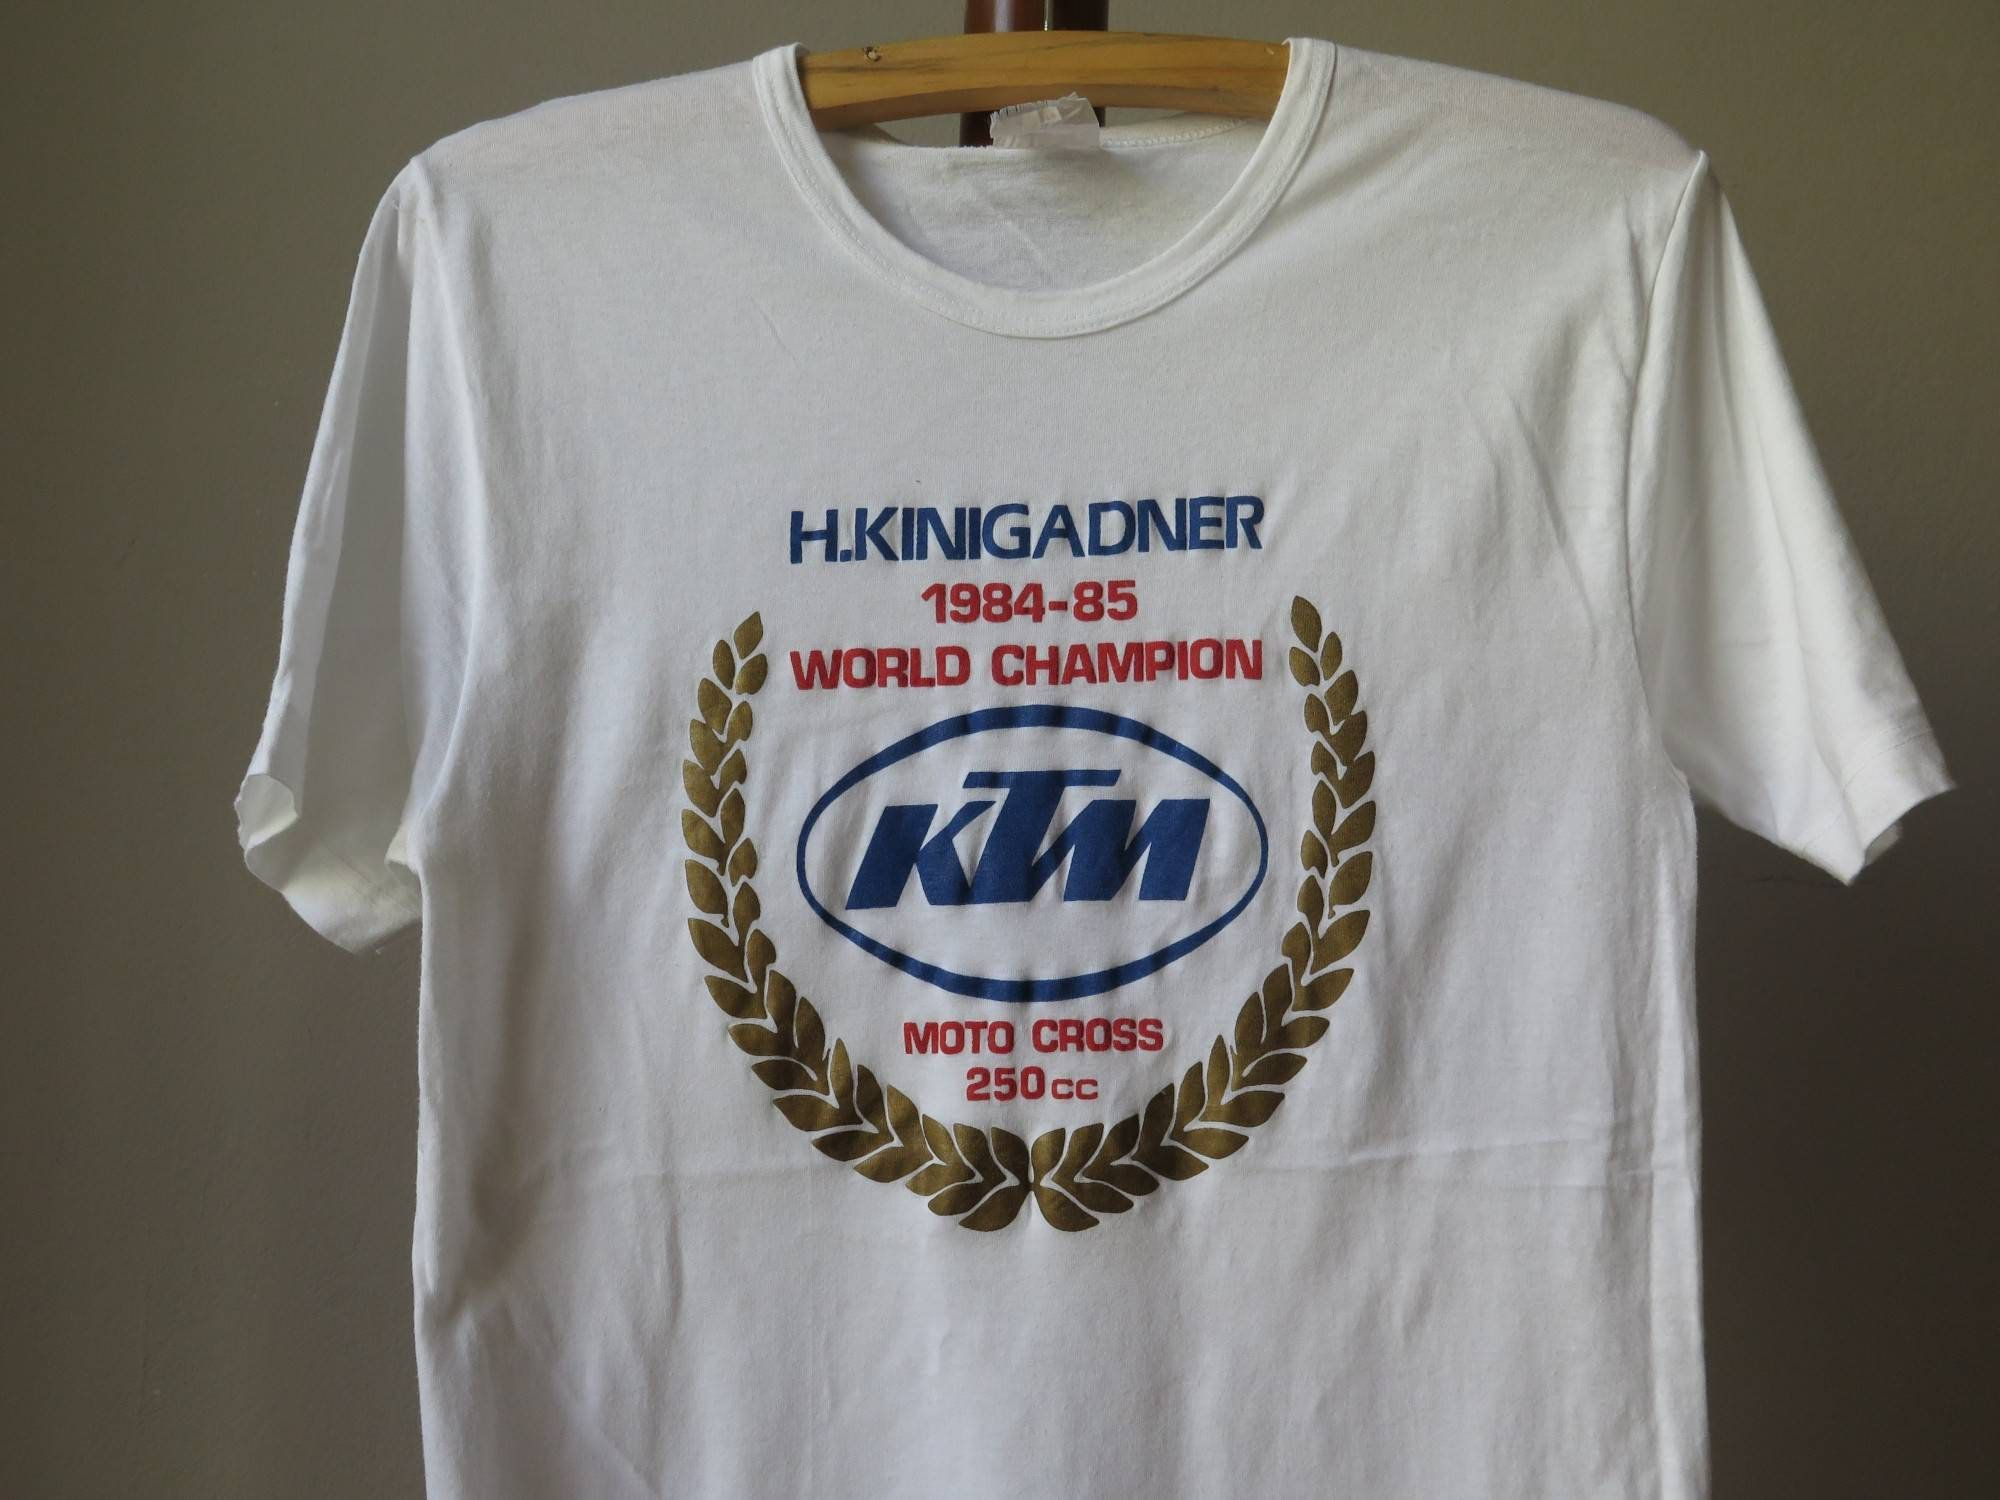 Vintage Ktm Motocross Tshirt 80s Motocross Tee Ktm Motocross Etsy In 2020 T Shirt Champion Tees Ktm Motocross